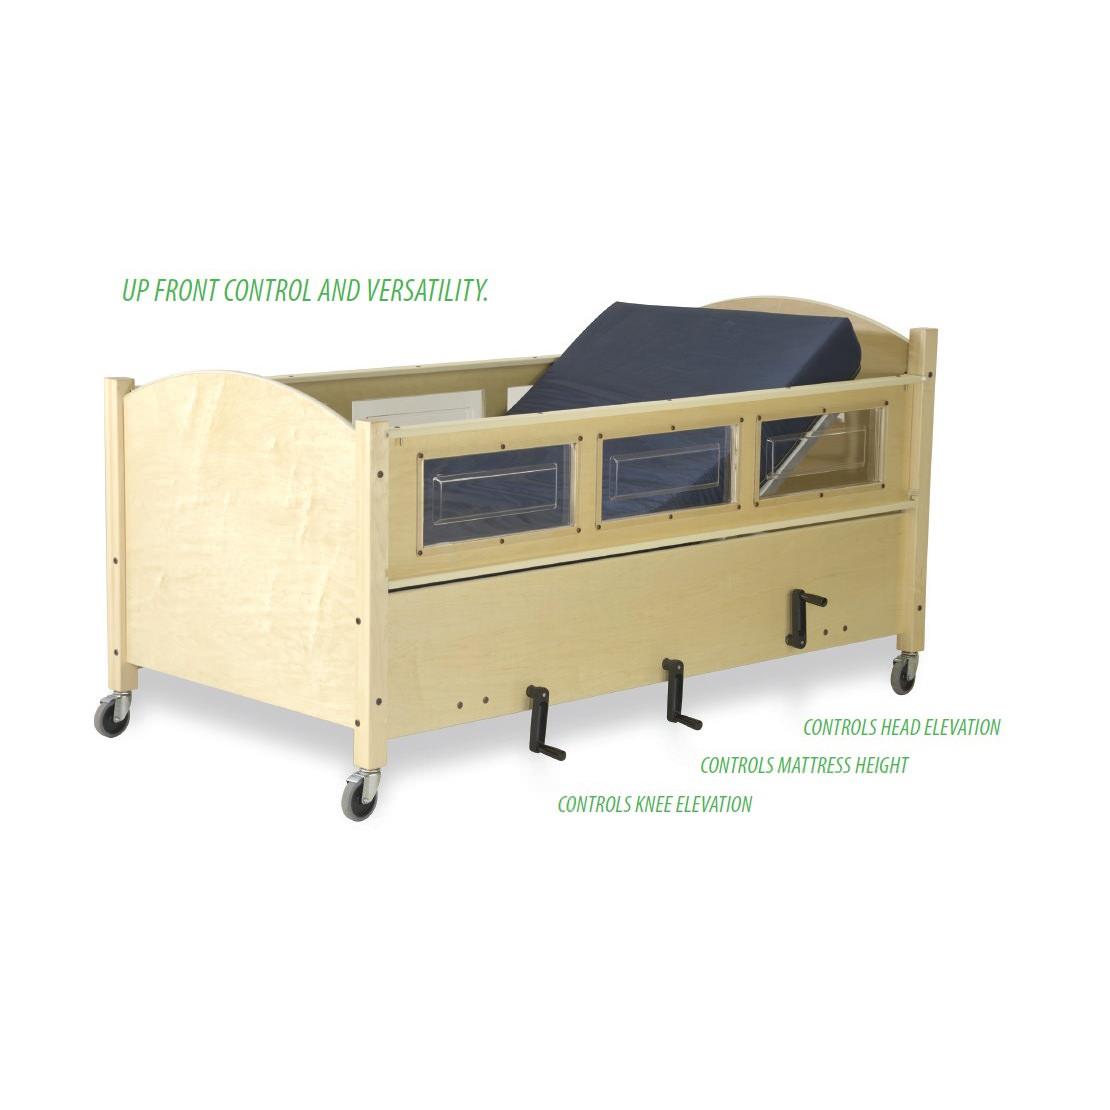 SleepSafe manual articulating low bed